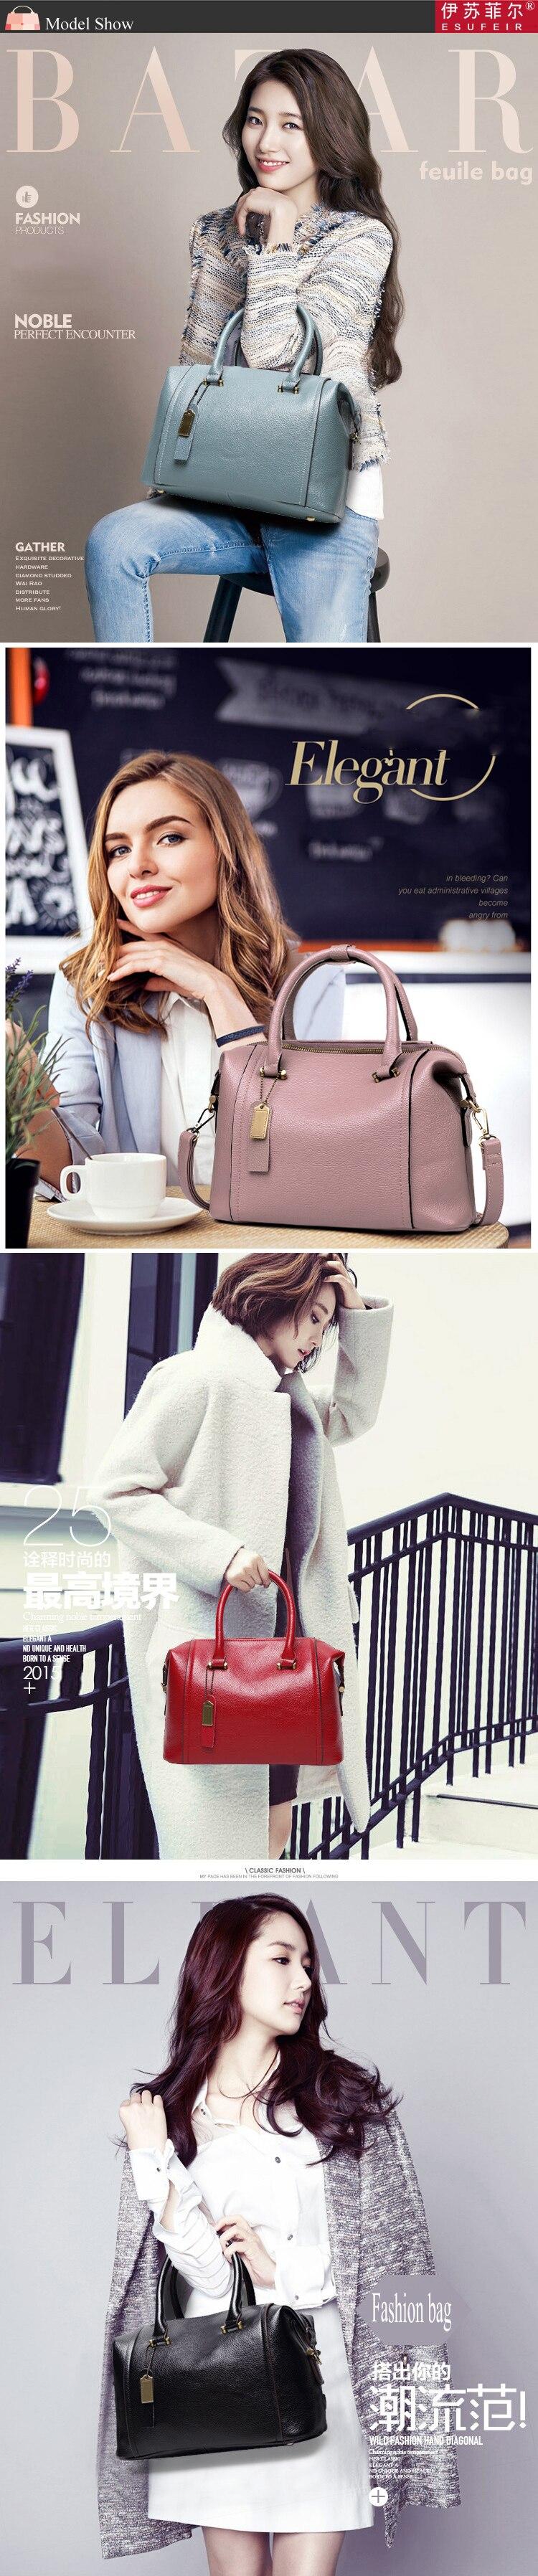 women-handbag9